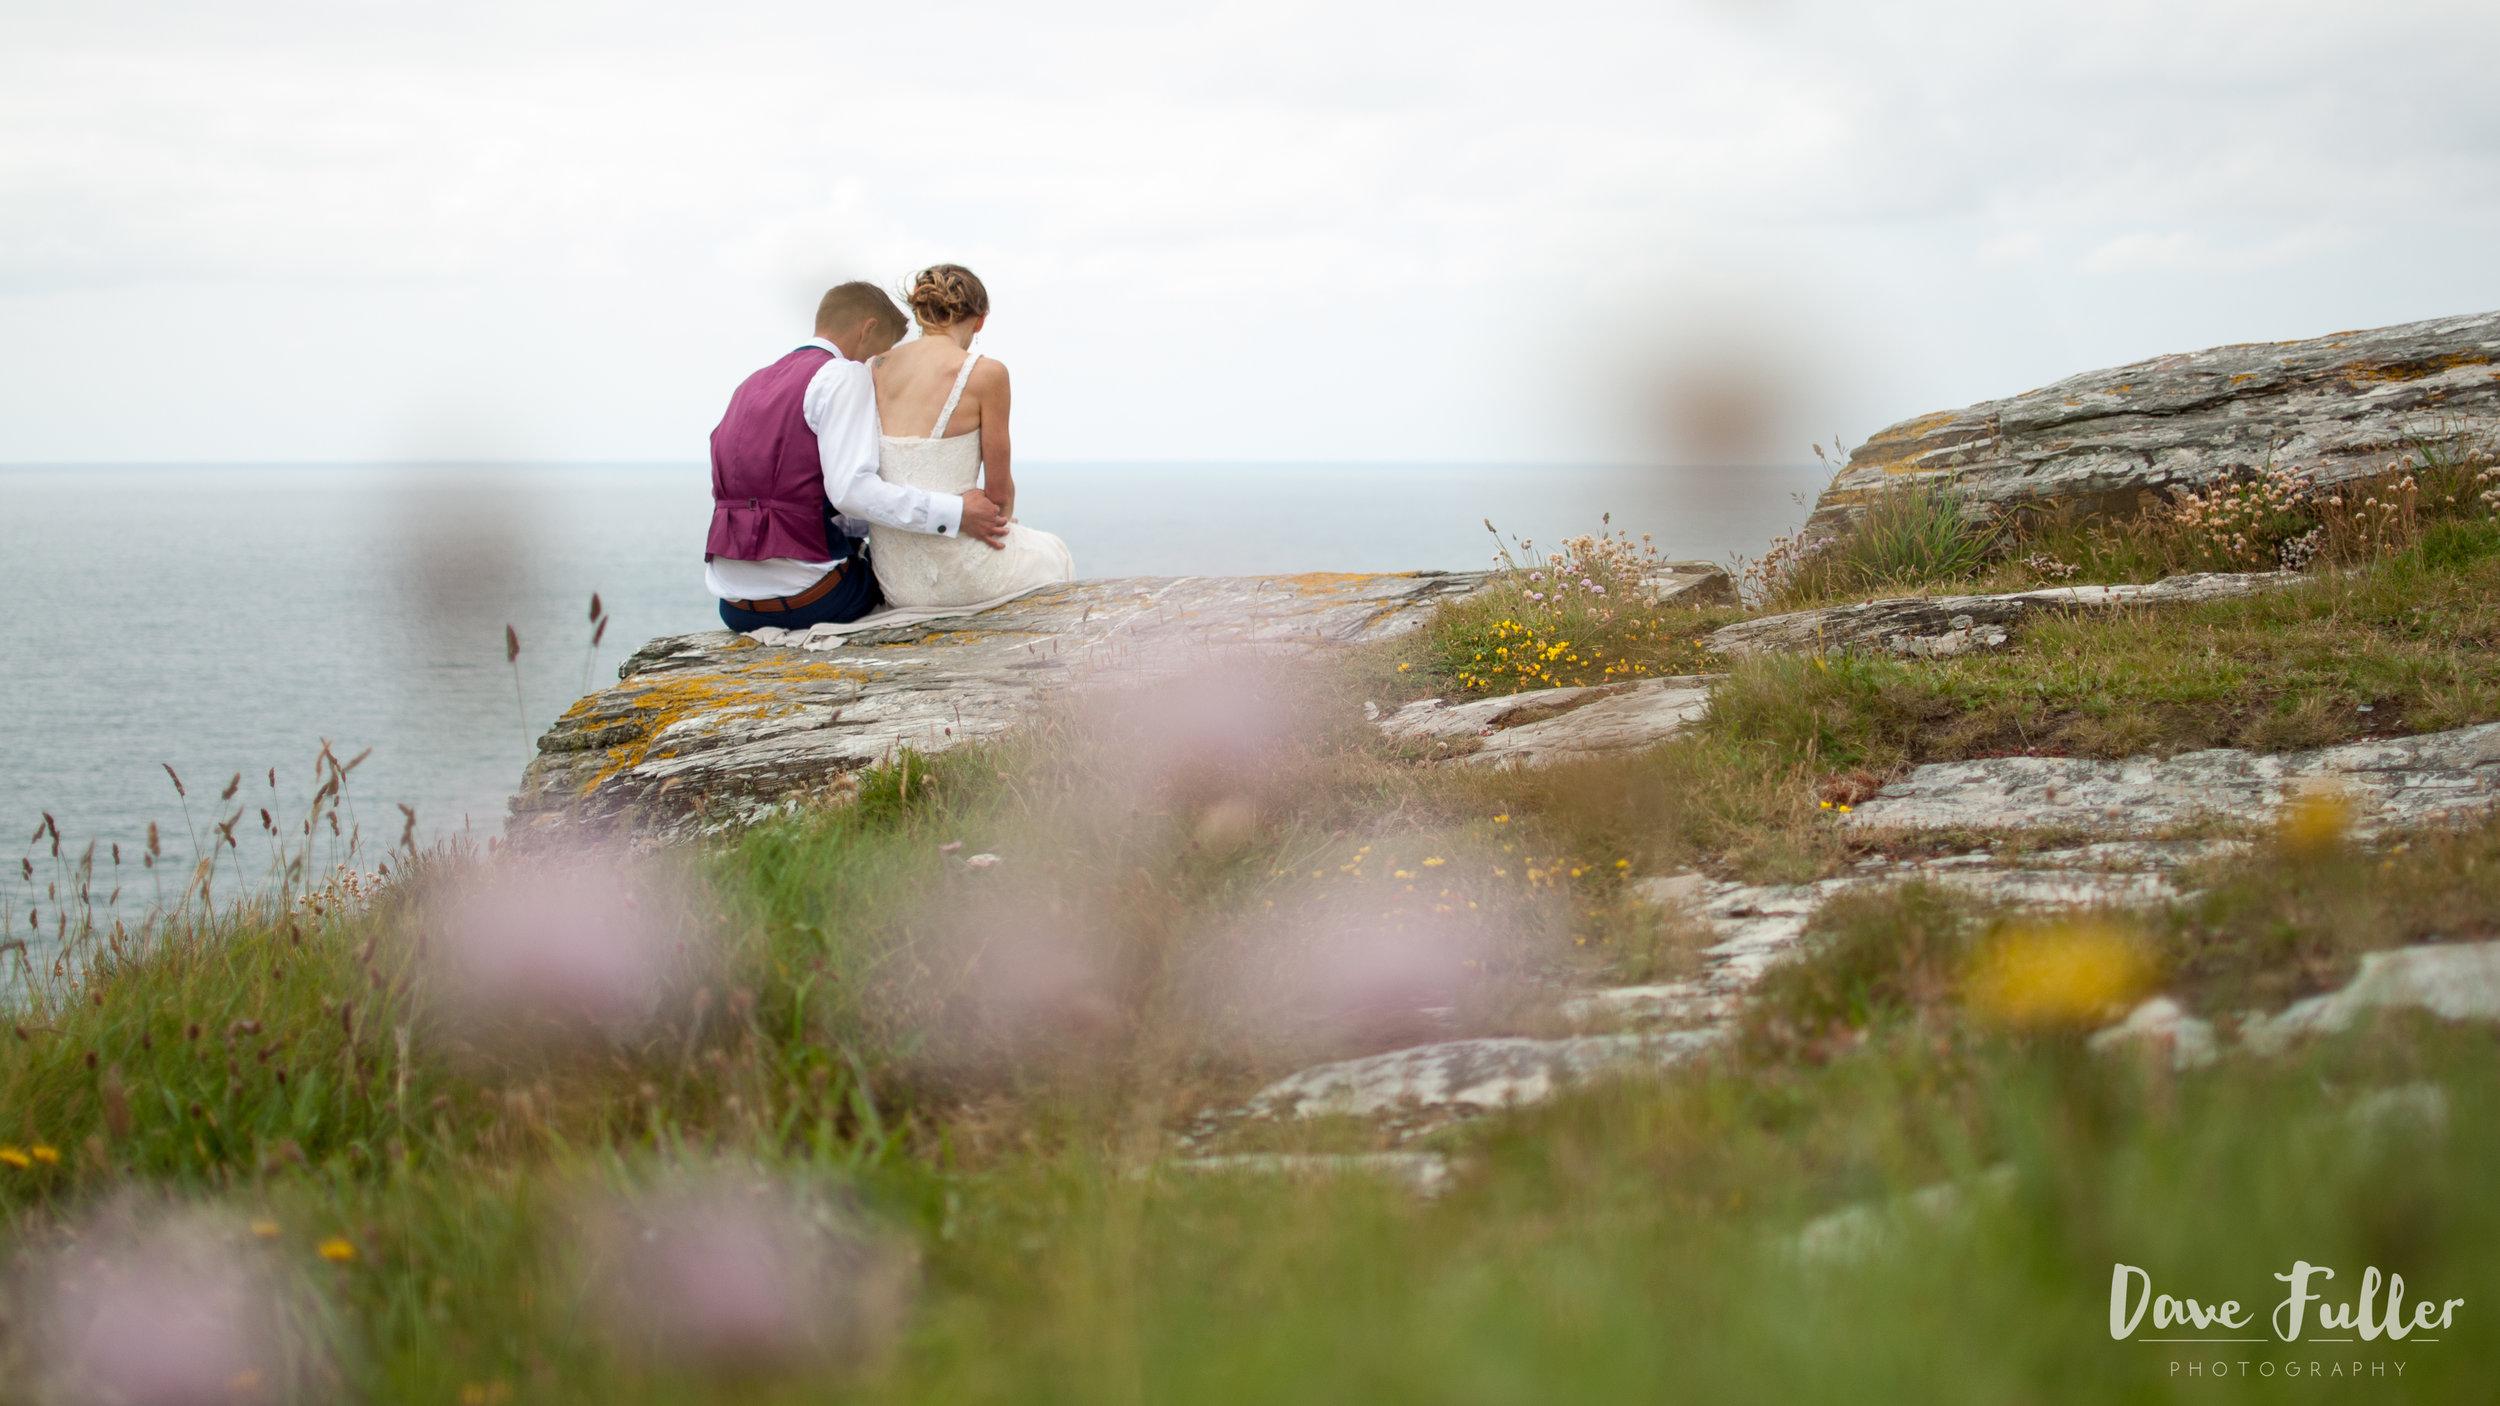 Nottingham Wedding Photographer - ward-0650.jpg